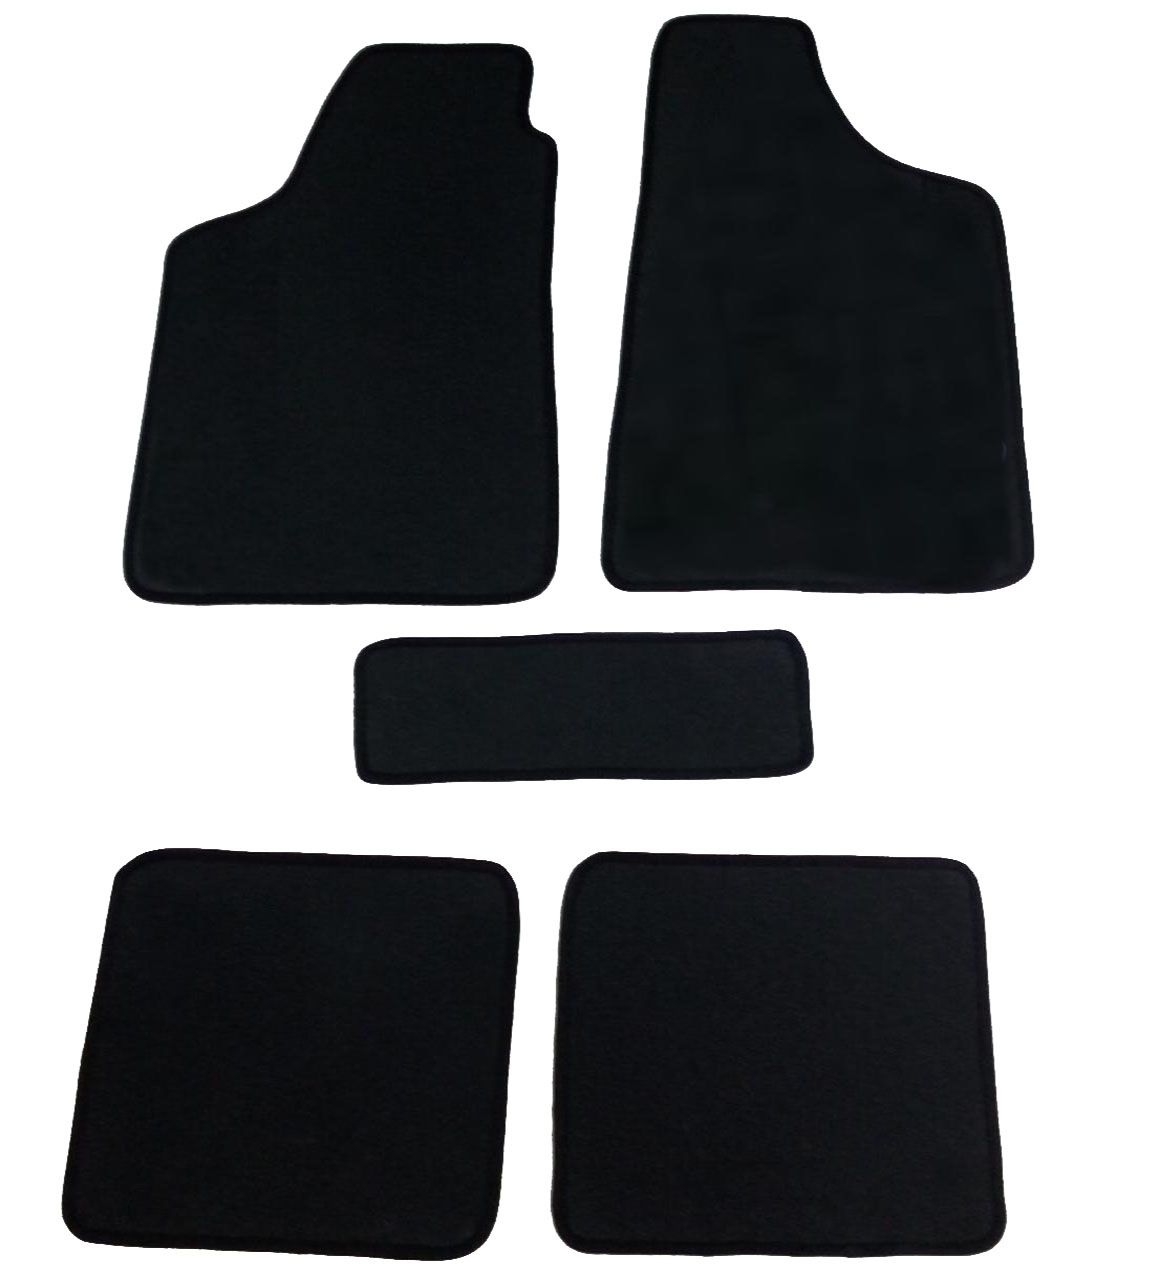 Tapete Fiat Tipo Carpete  Base Pinada